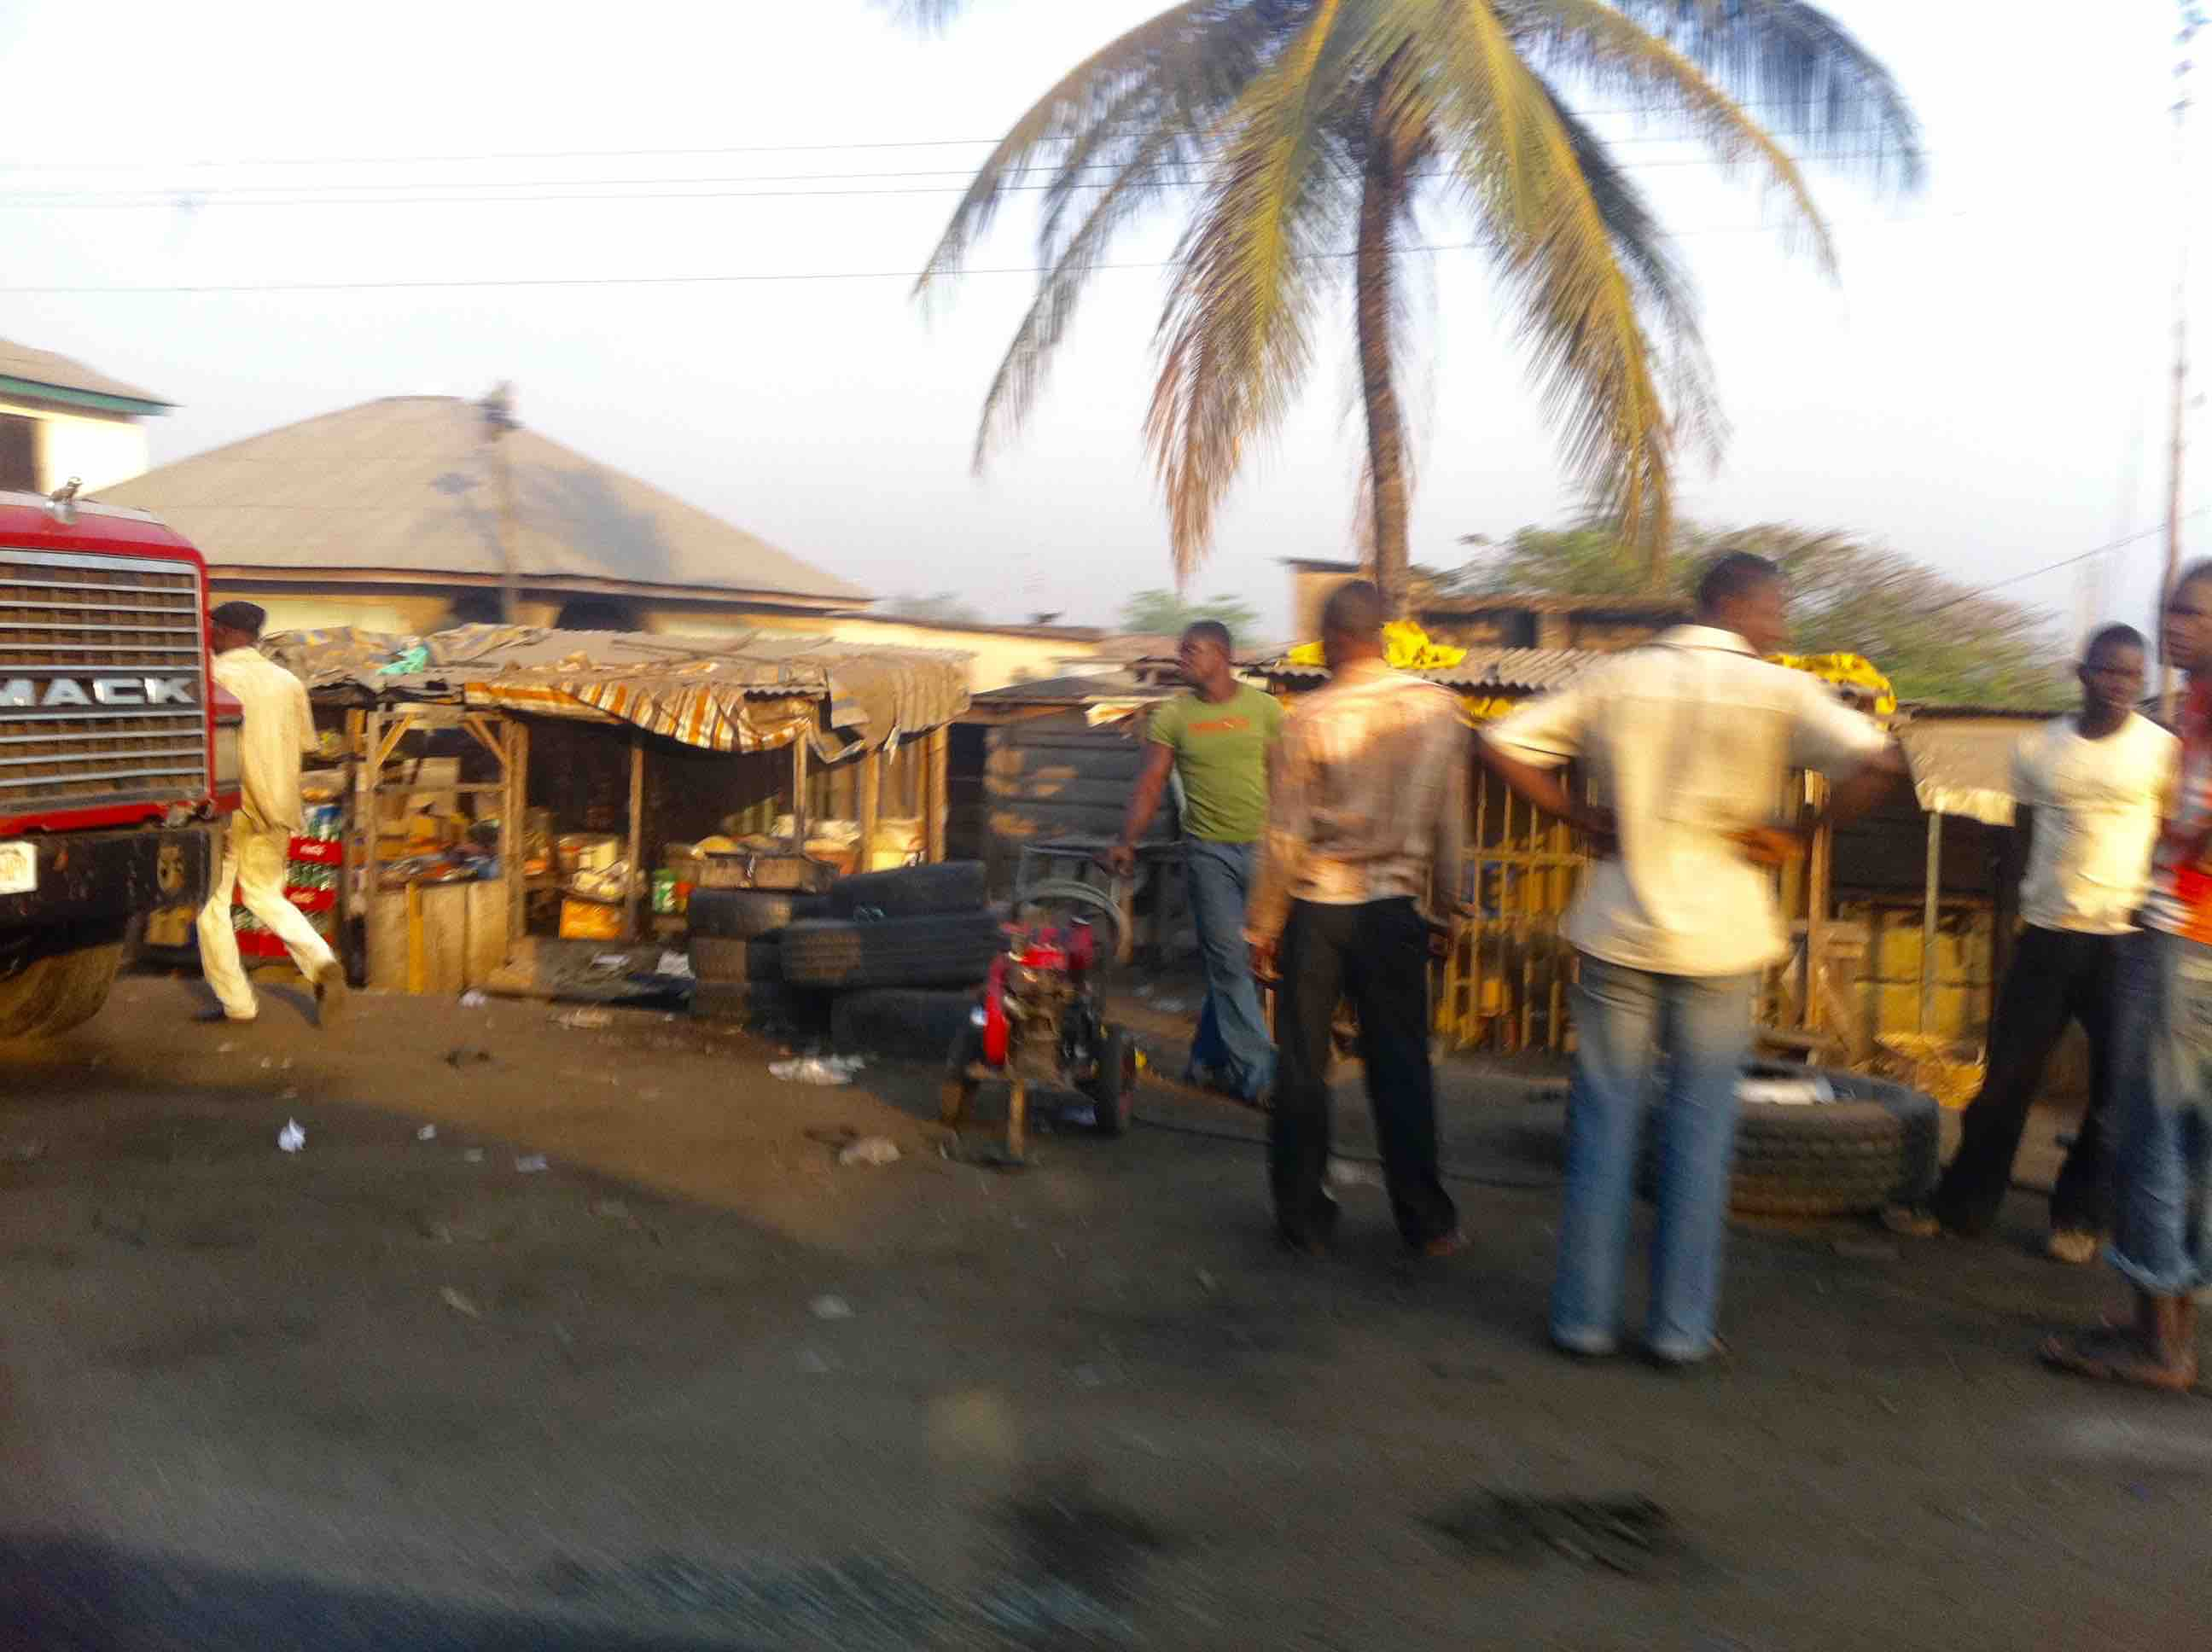 Street scene, Lokoja, Kogi, Nigeria. #JujuFilms